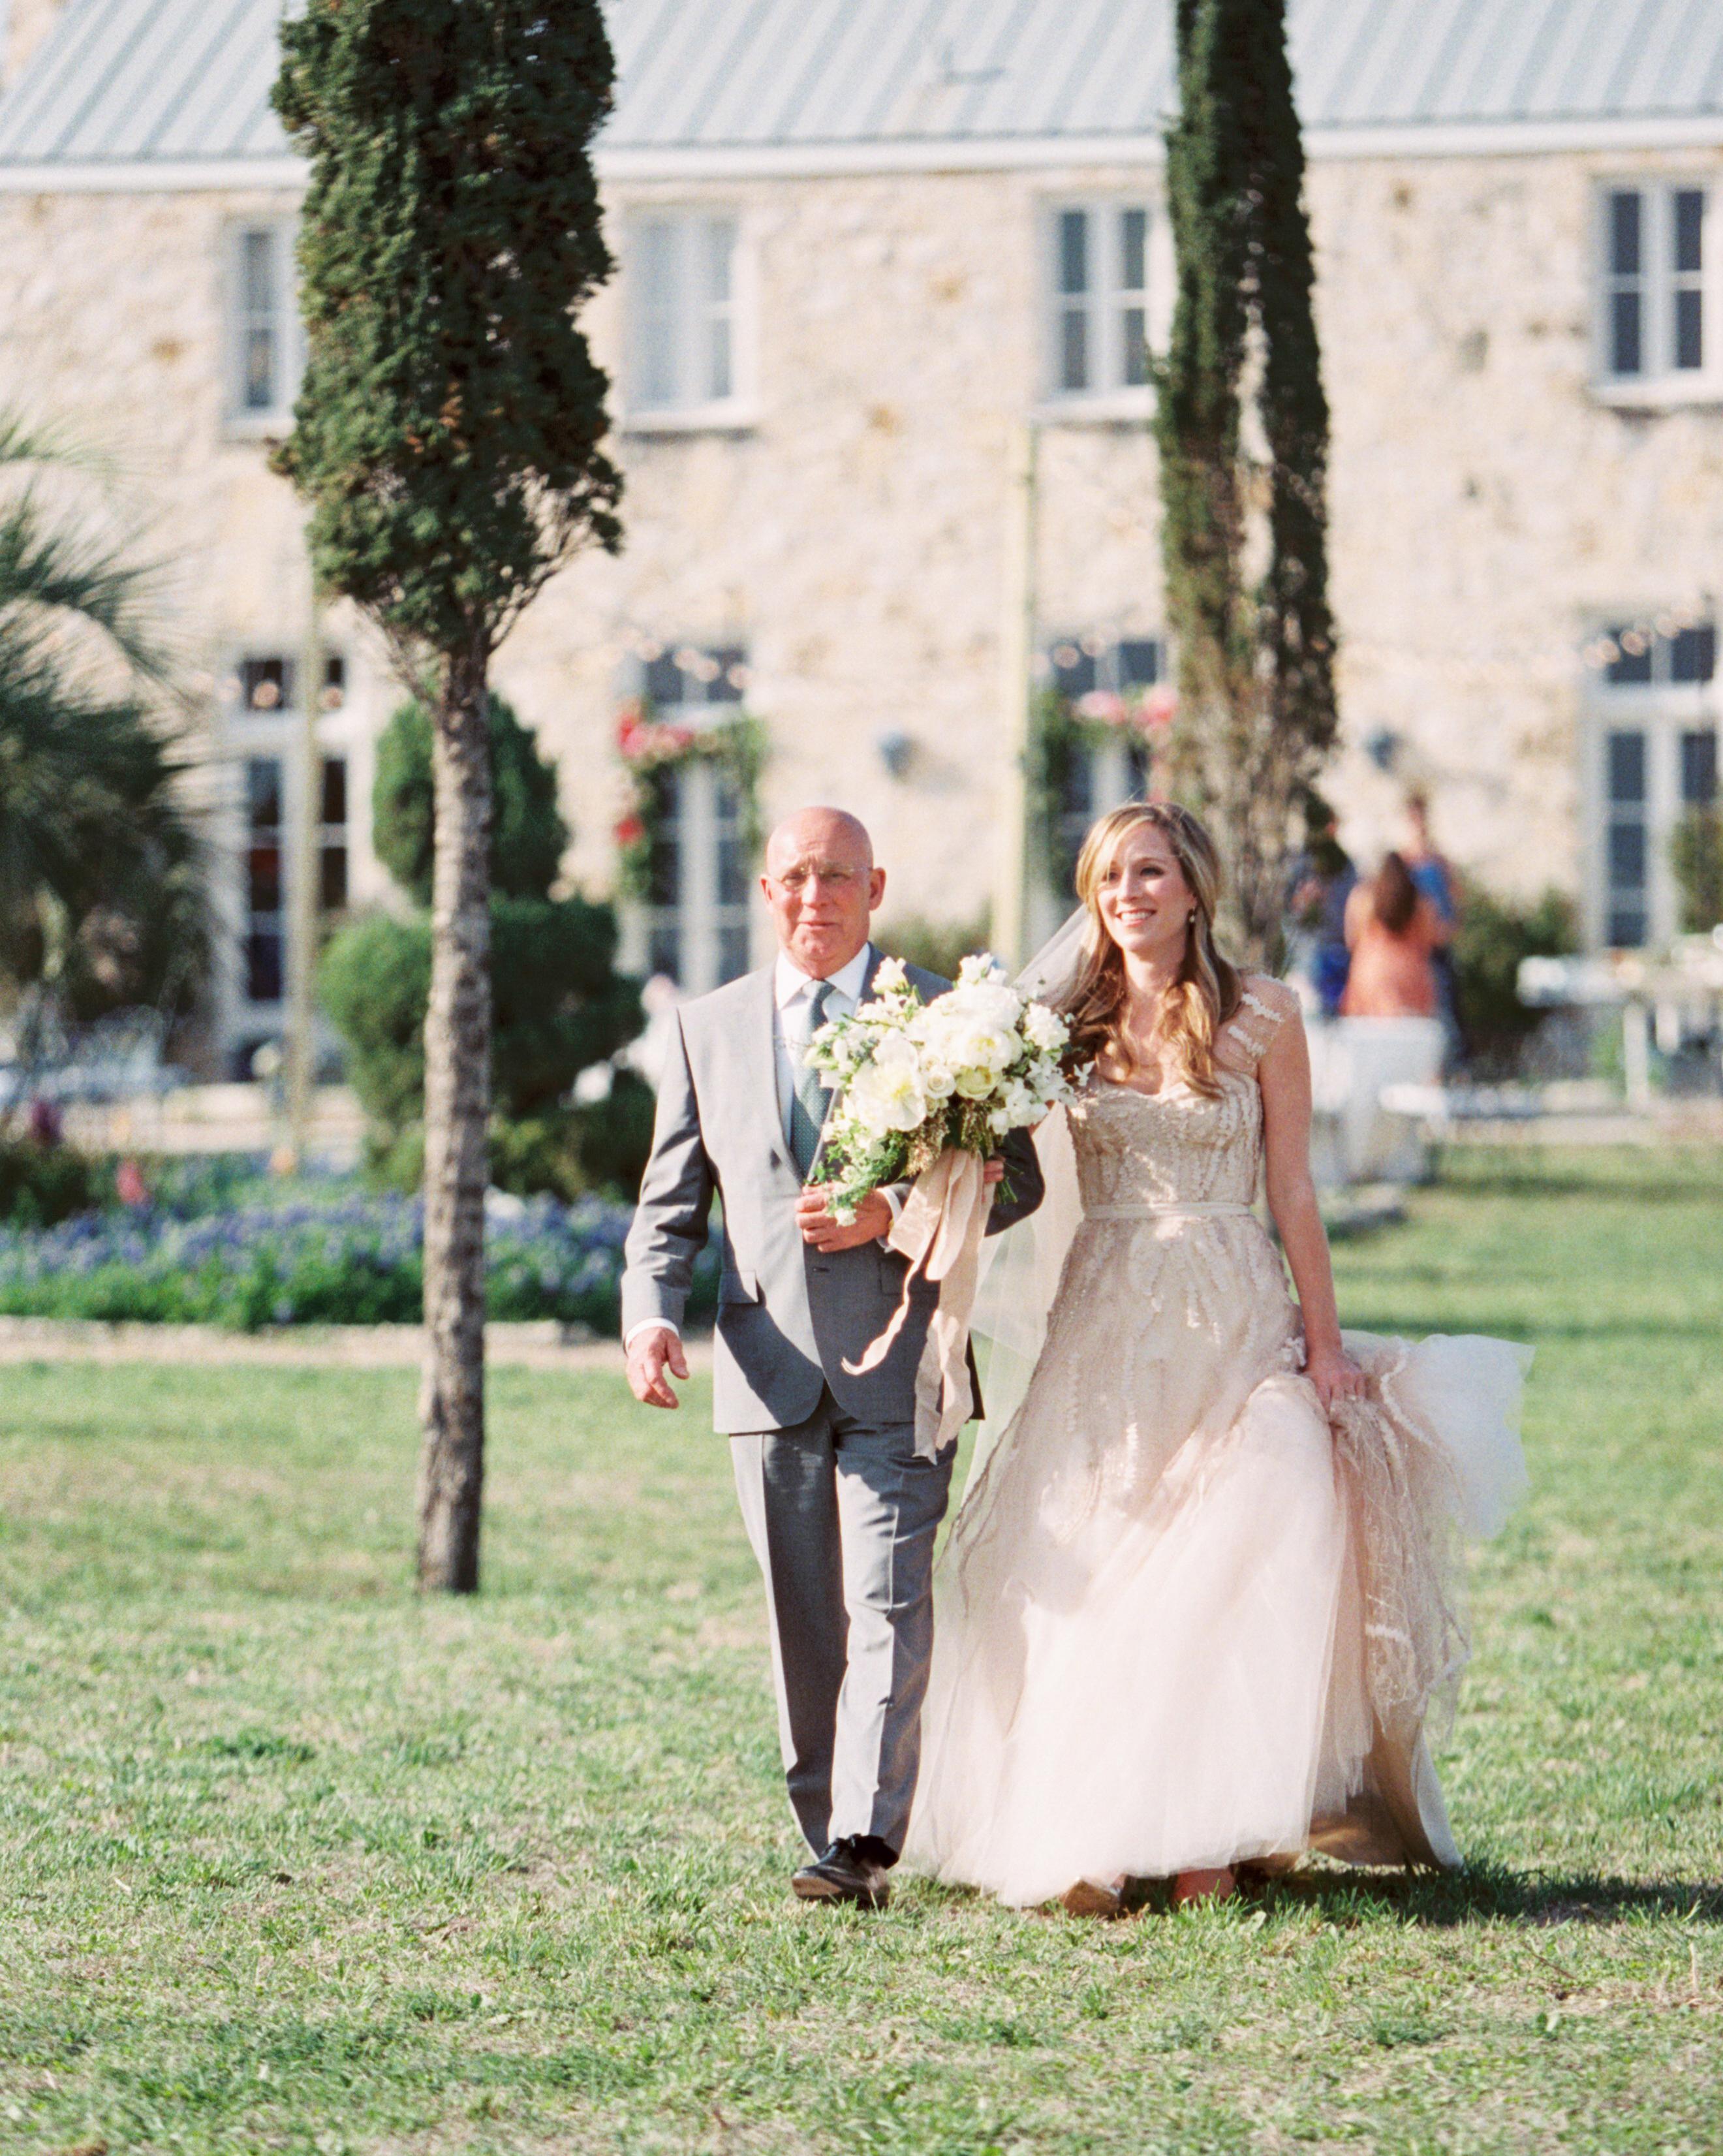 paige-chris-wedding-suite-074-s111485-0914.jpg